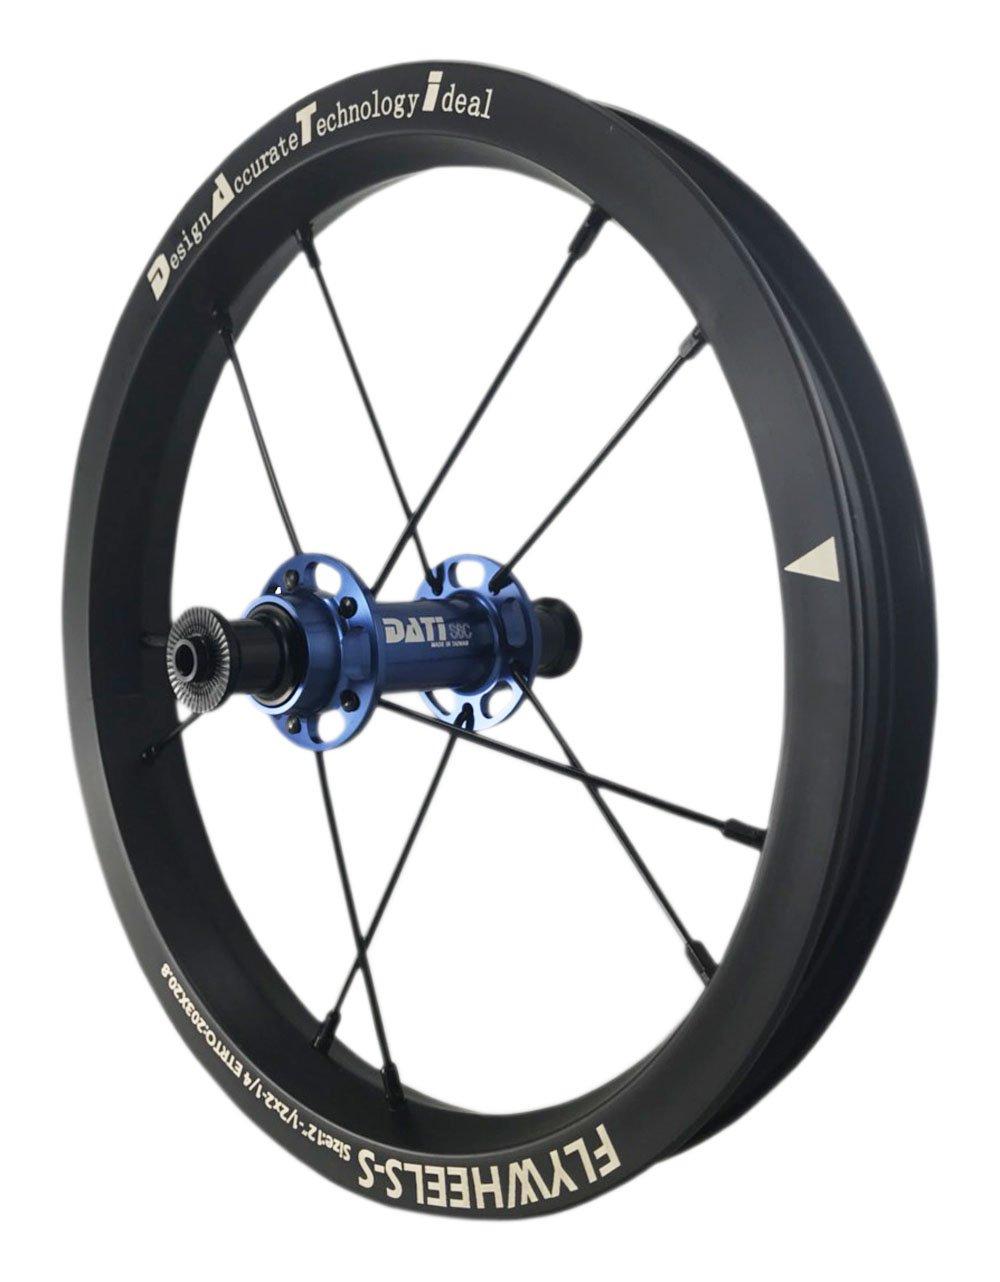 DATI 12インチ S6C-W Alloy バランスバイク Kids Balance Bike Bicycle Super light 子供自転車ホイール B07BLV5MCN 90x10MM for Bixbi Puky|青 青 90x10MM for Bixbi Puky